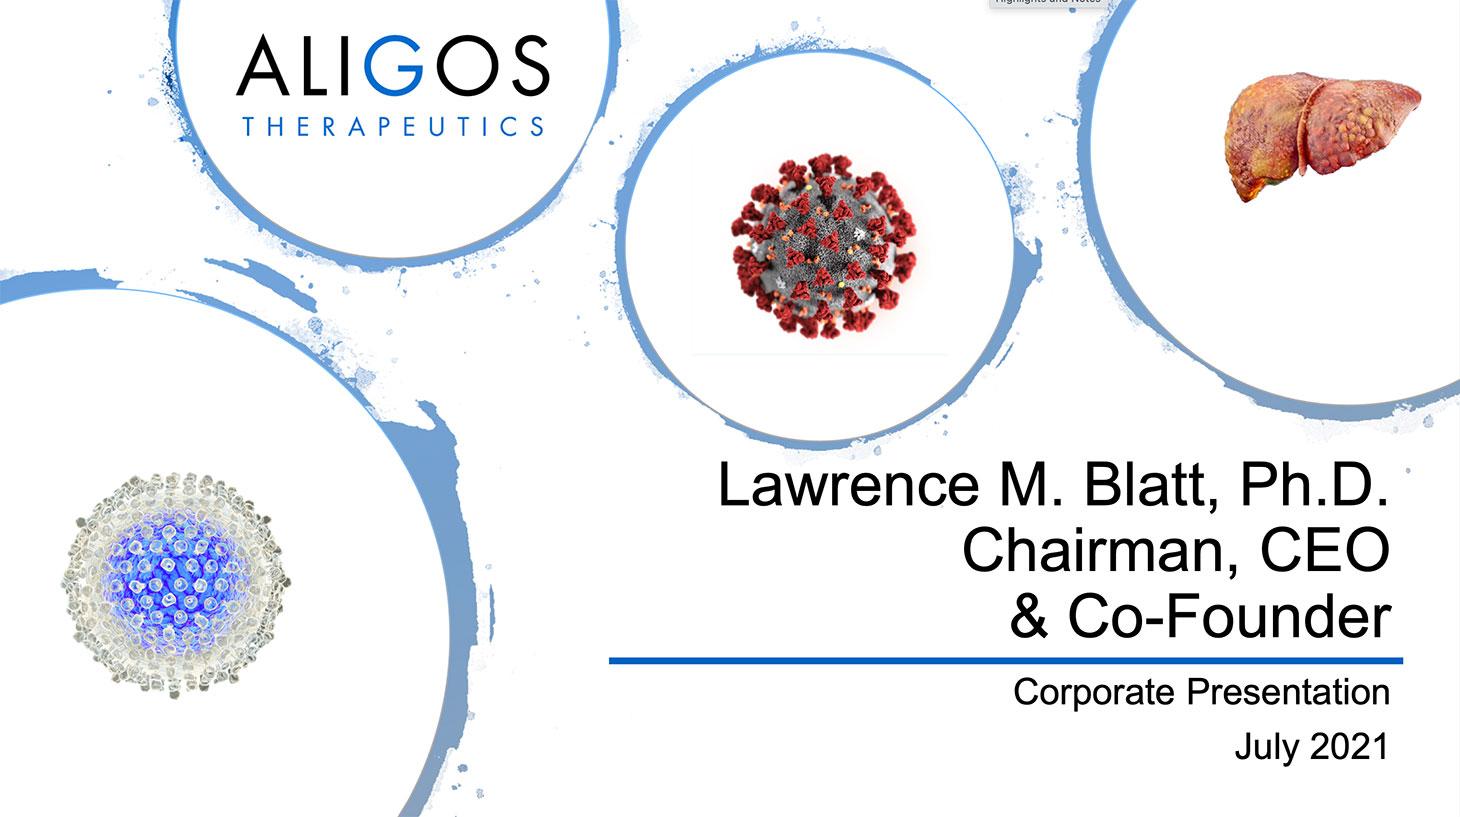 Aligos Corporate Presentation